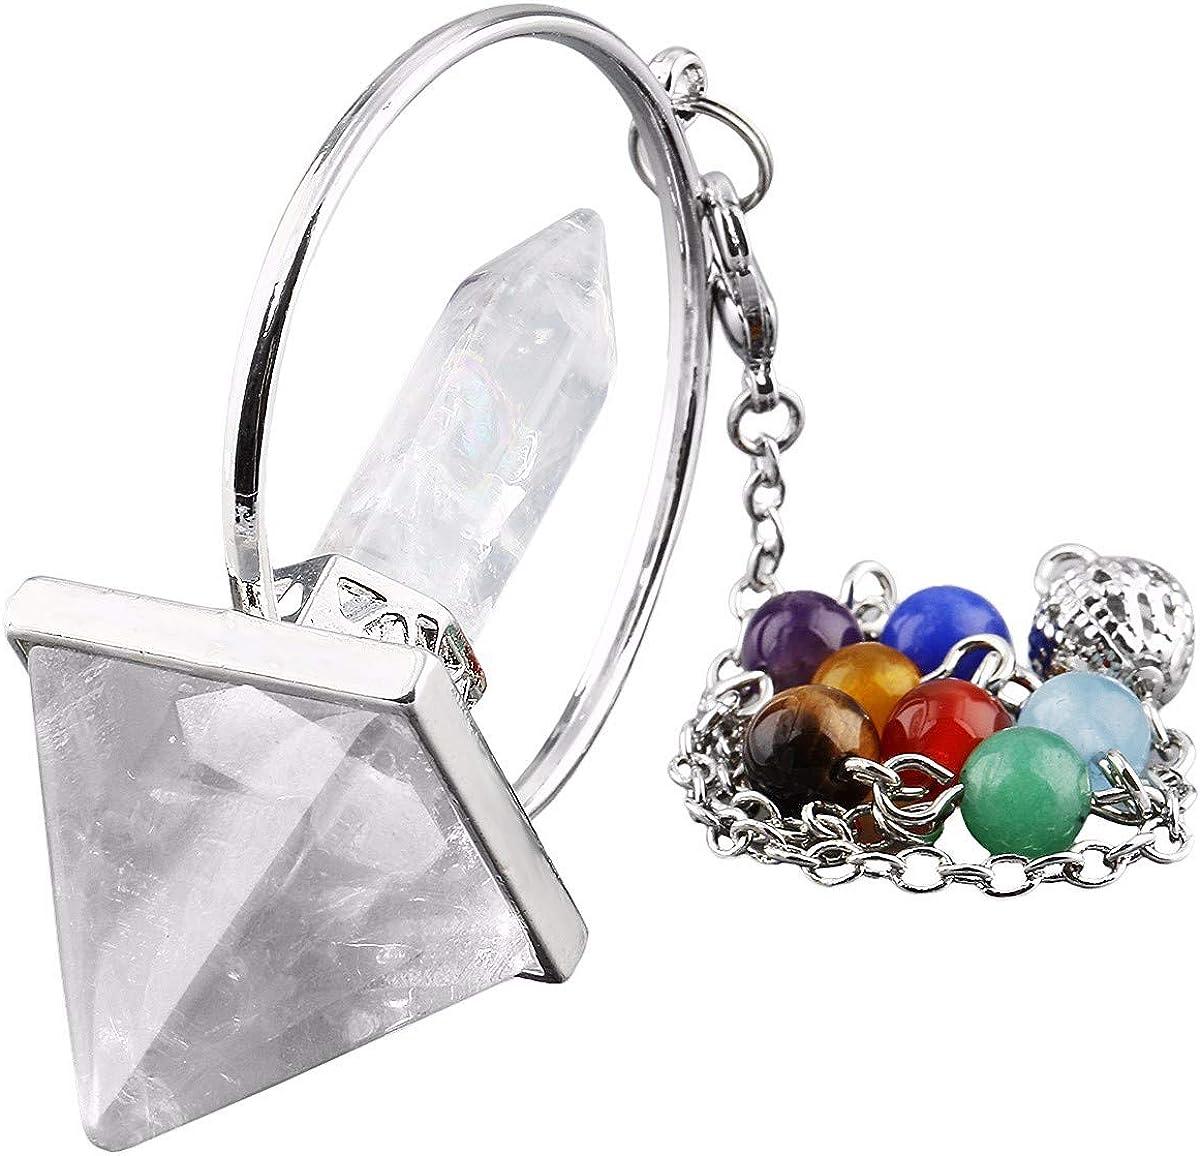 TUMBEELLUWA Healing Crystal Quartz 7 Chakra Pendulum Dowsing Gemstone Divination Reiki Stone